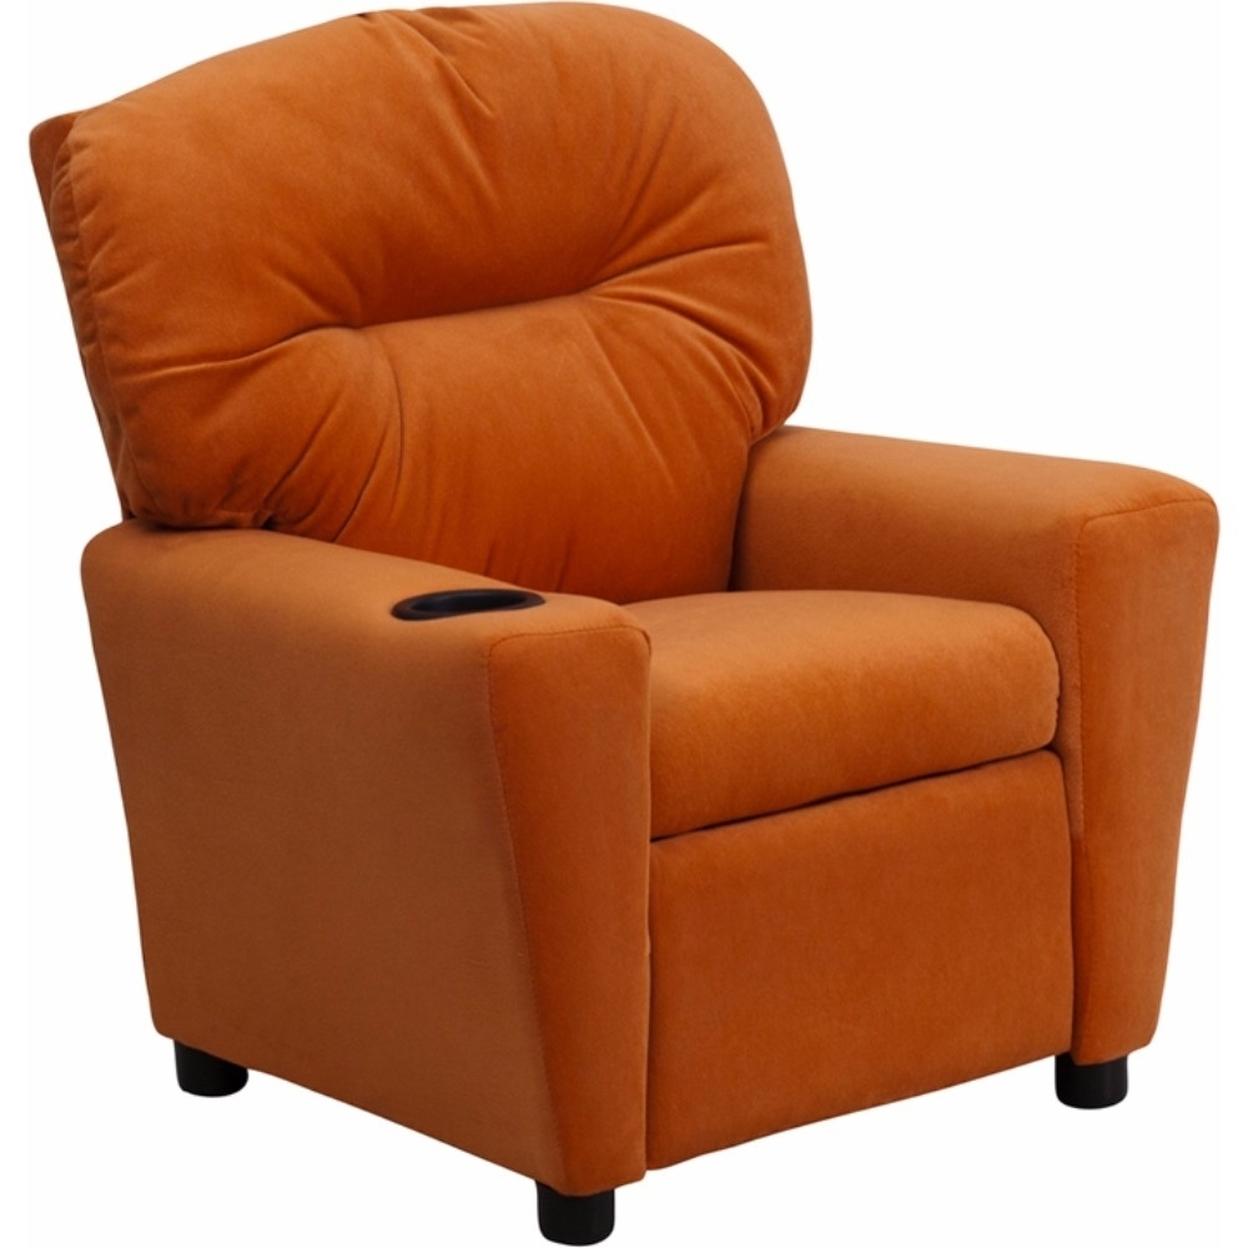 Flash Furniture Contemporary Orange Microfiber Kids Recliner with Cup Holder [863-Bt-7950-Kid-Mic-Org-Gg] 59e46011e224613cc069199f